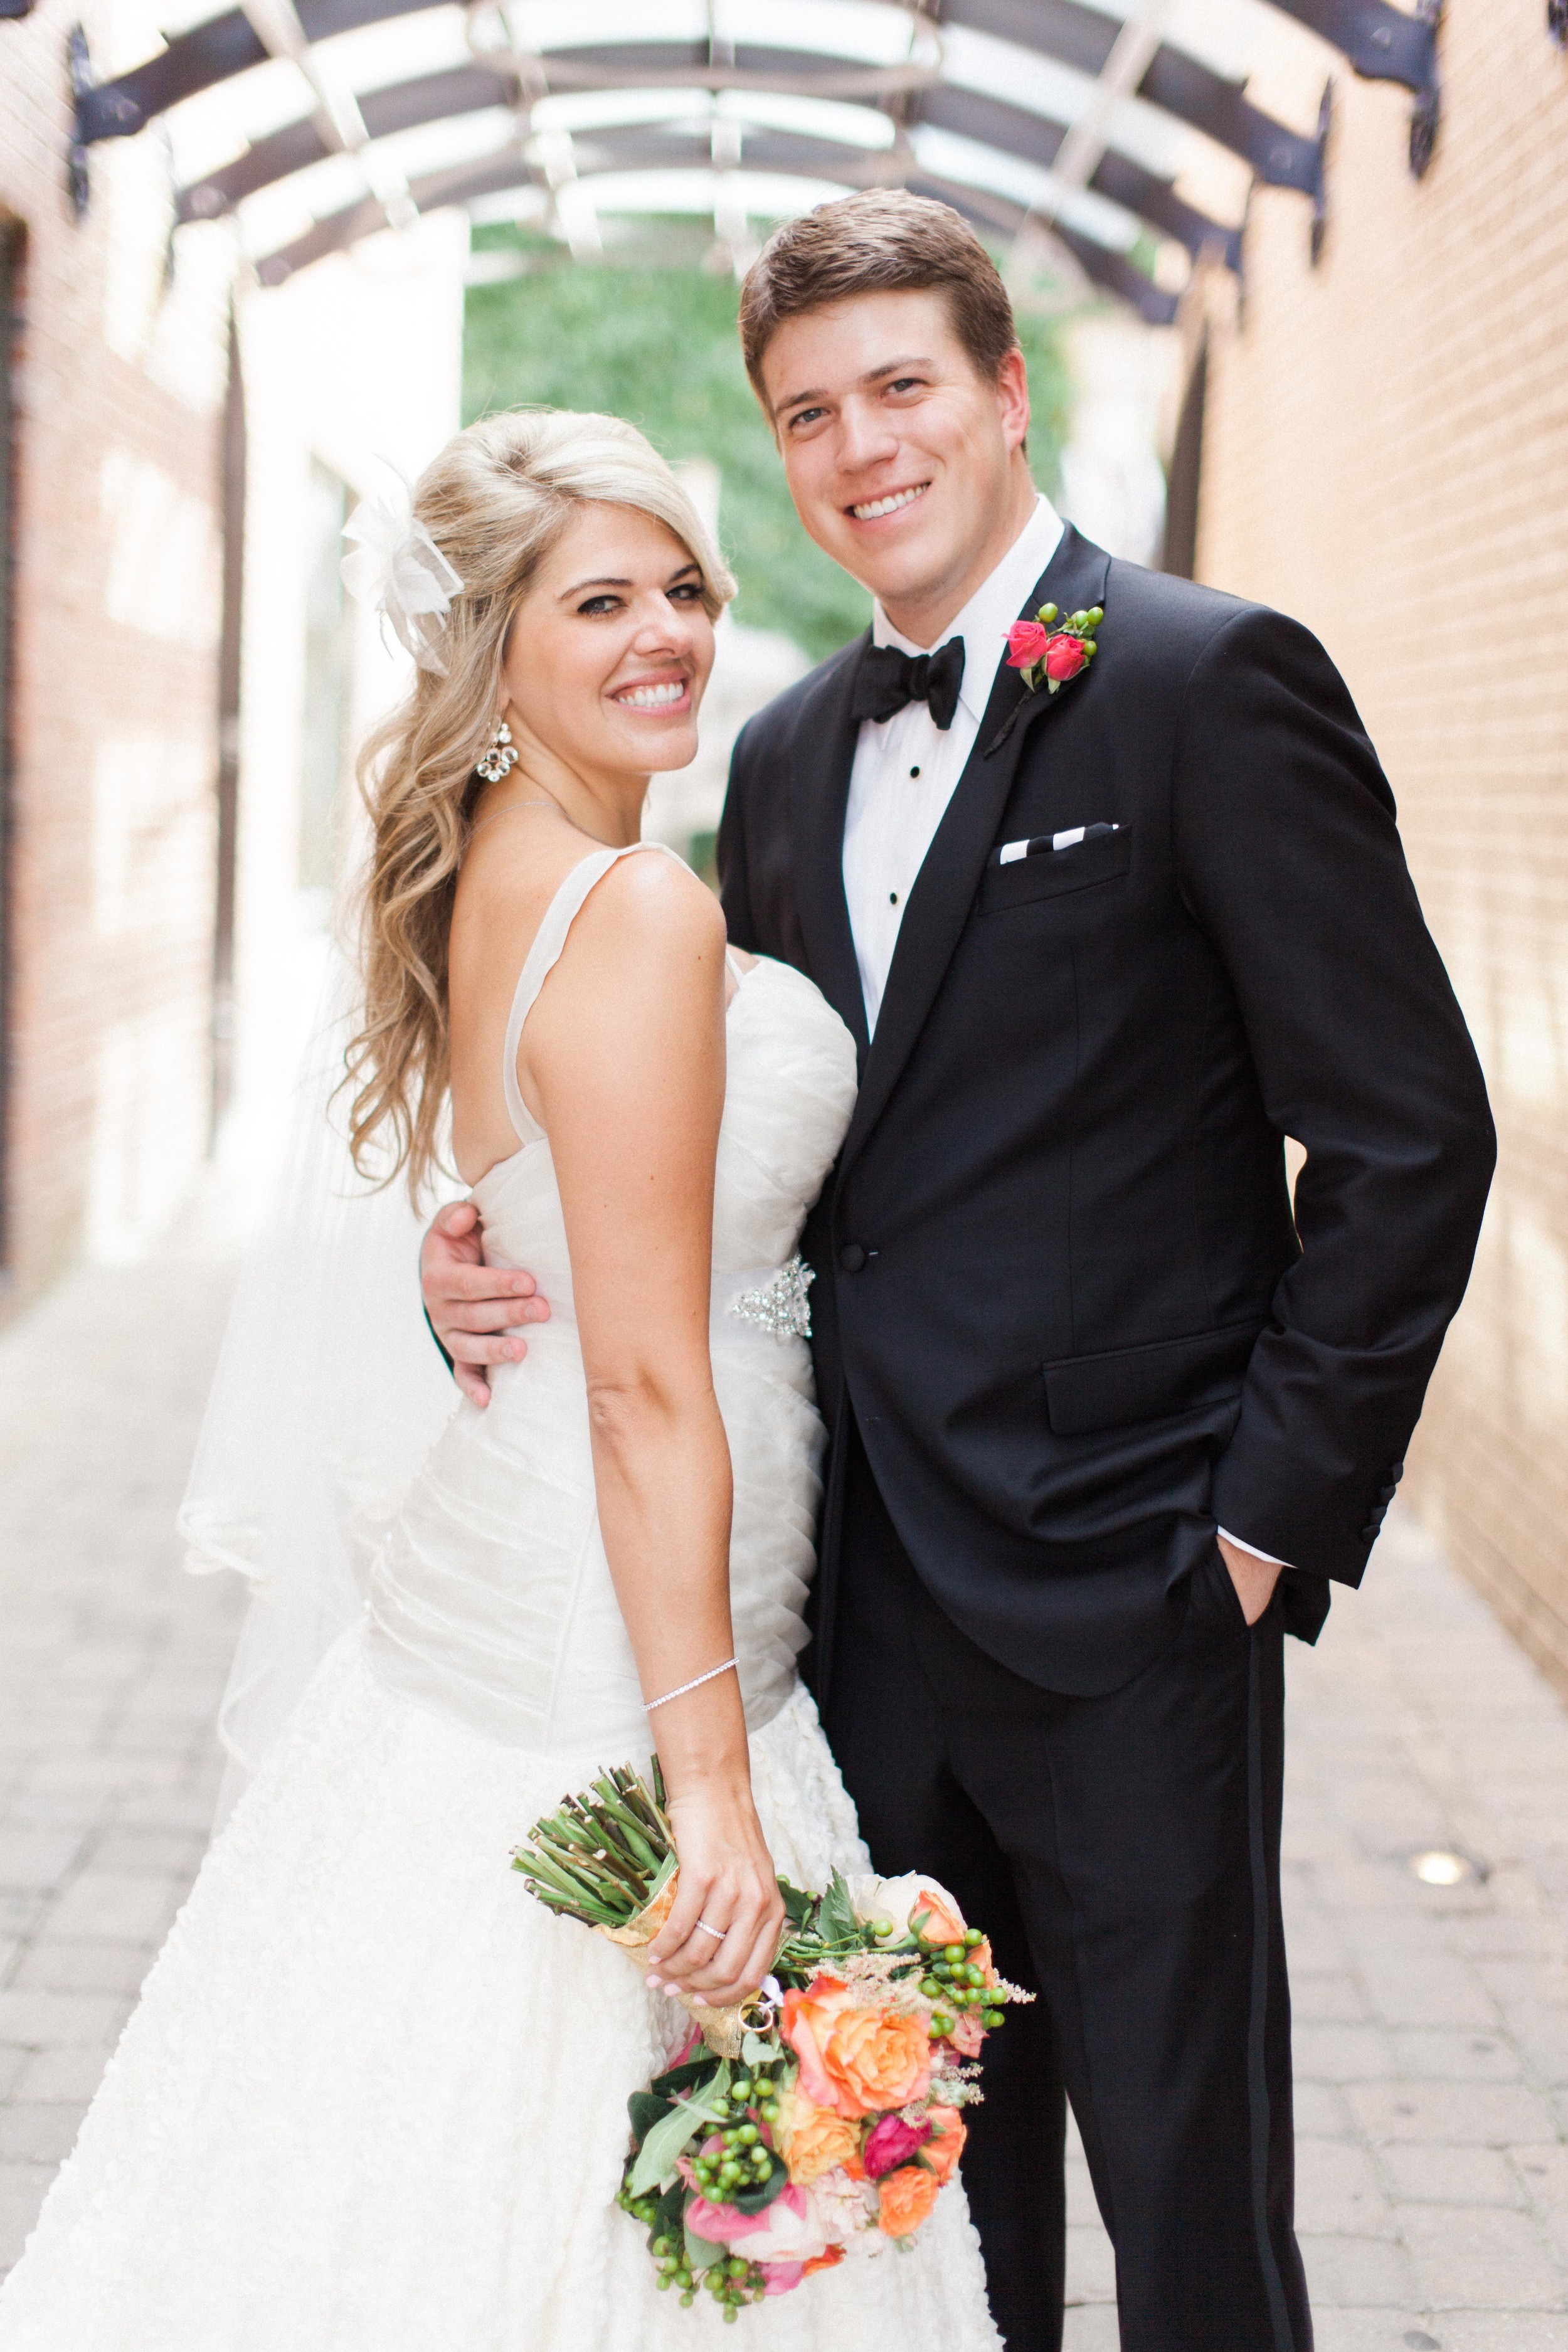 Chase Park Plaza St Louis Wedding Photo-1001.jpg